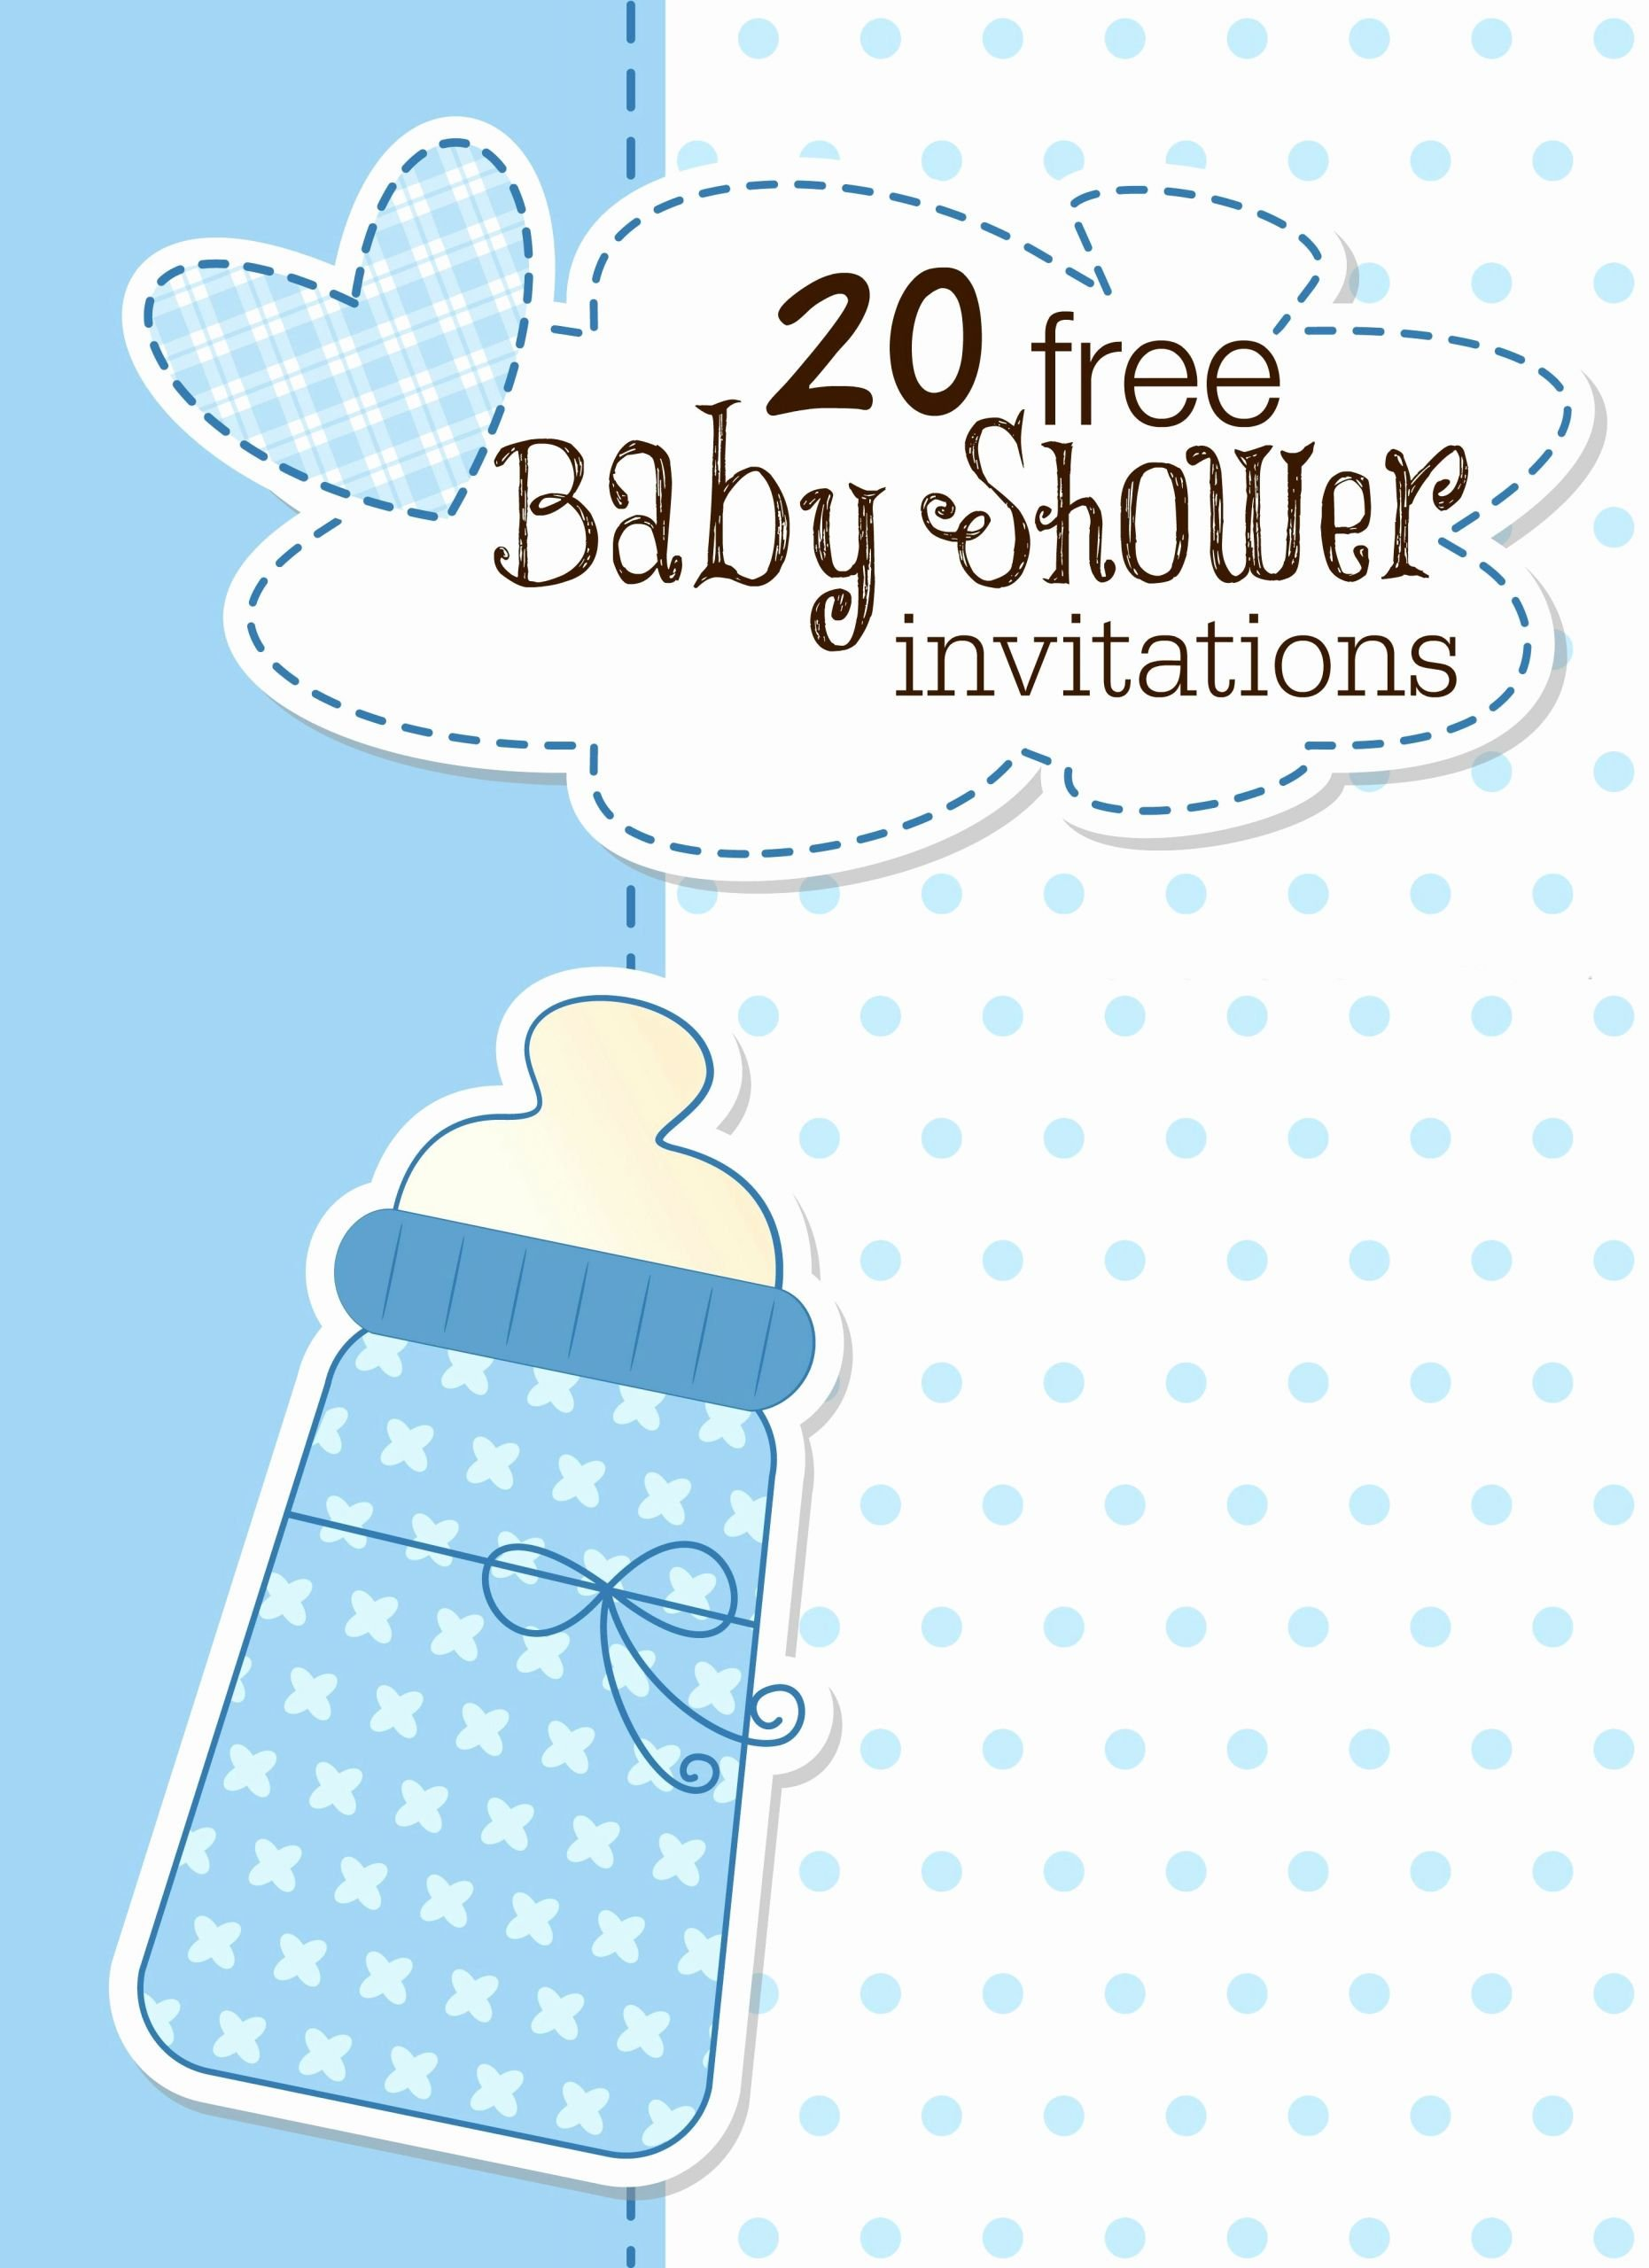 Free Shower Invitation Template Luxury Free Baby Shower Invitation Templates